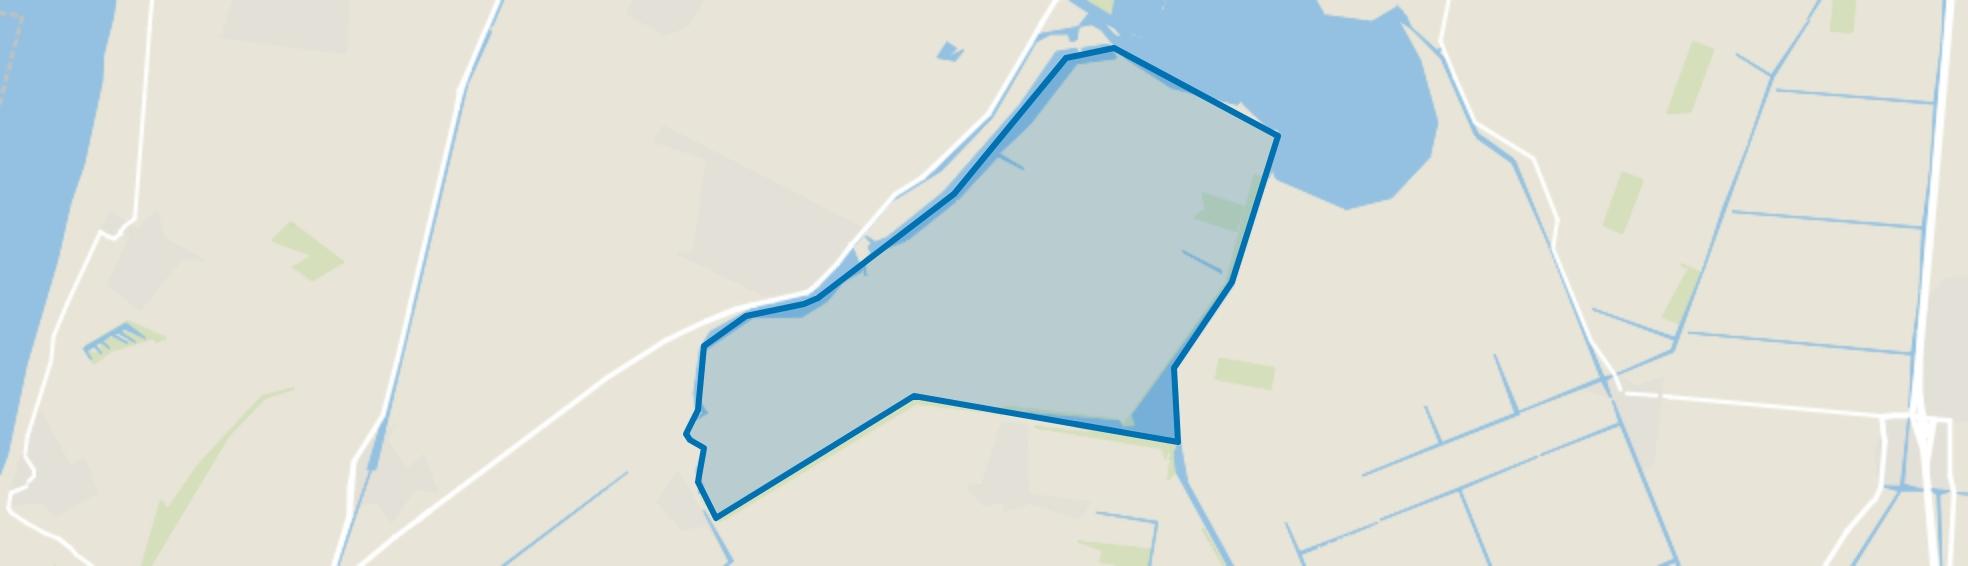 Oostpolder, Anna Paulowna map